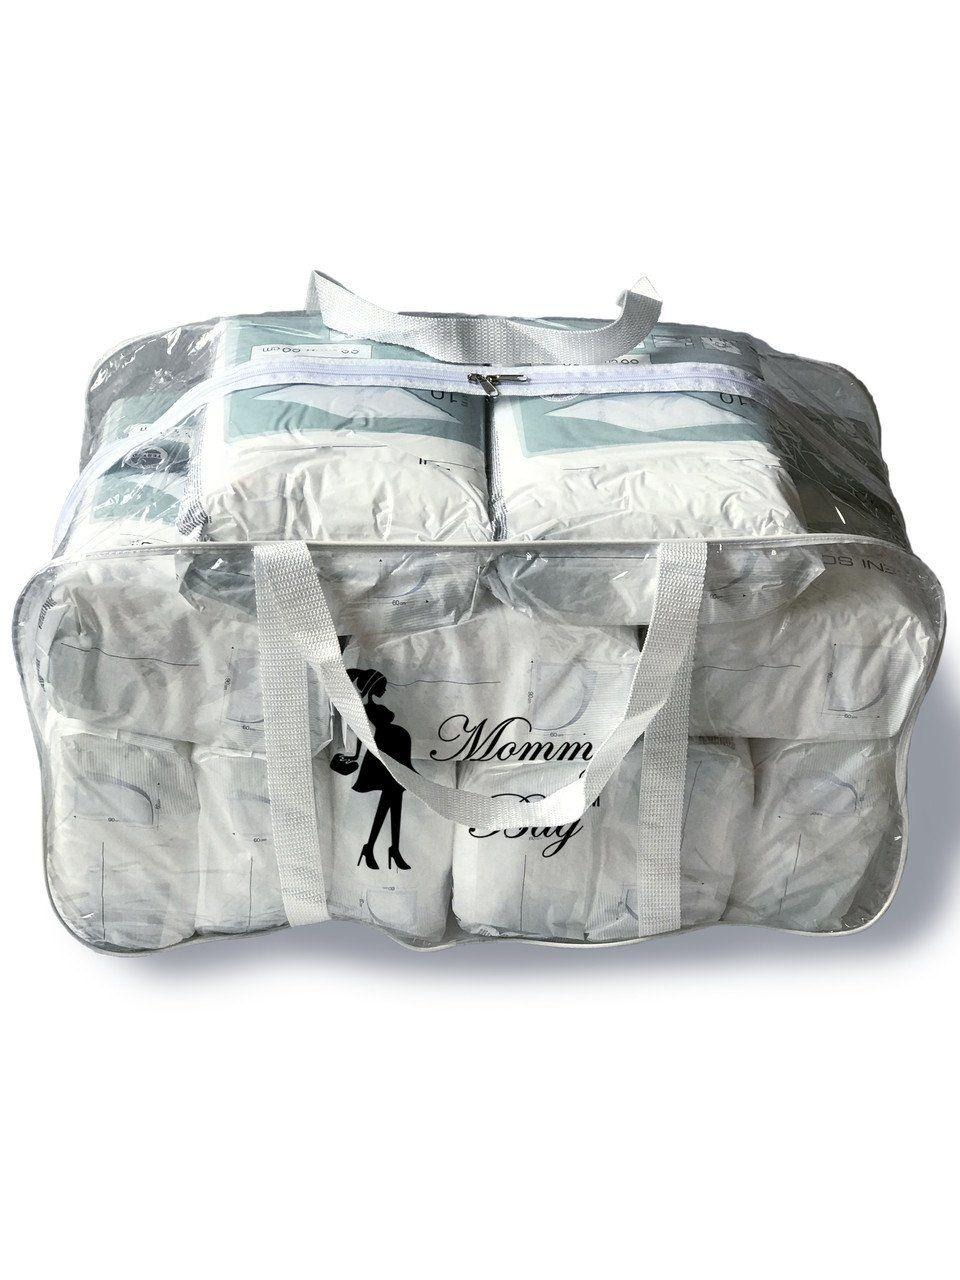 Сумка прозрачная в роддом Mommy Bag, размер - XL, цвет - Белый